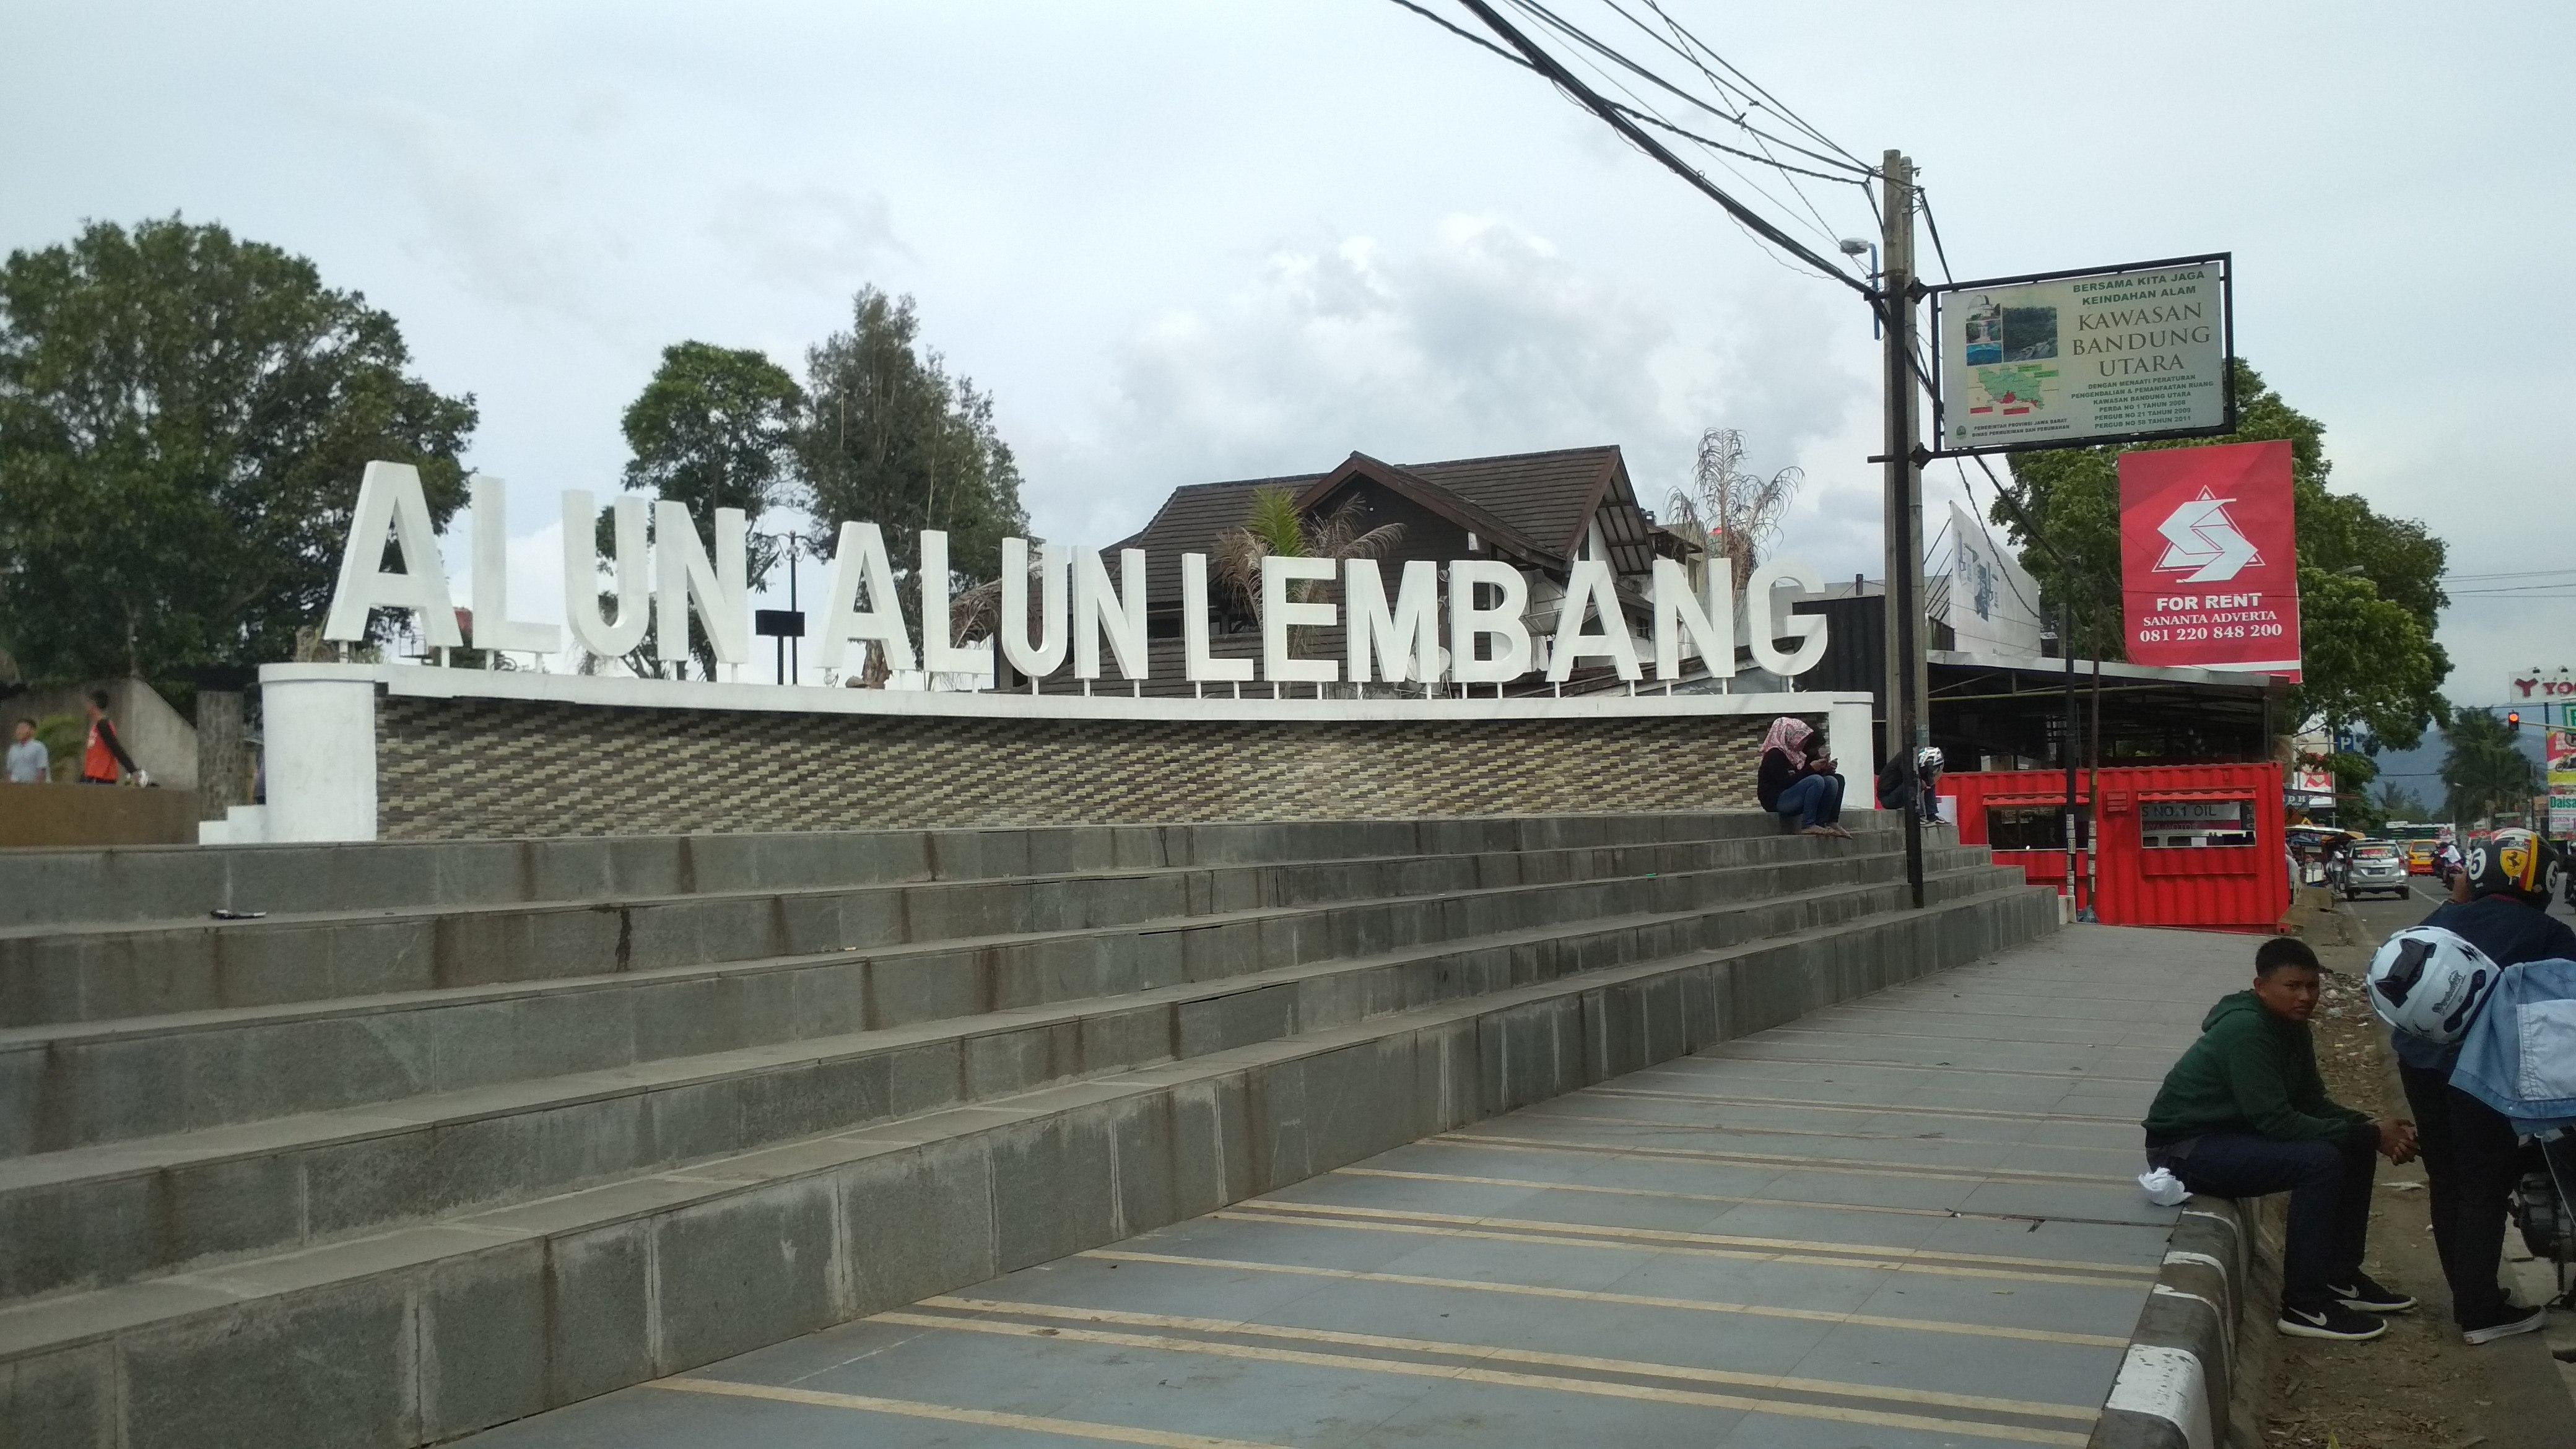 Alun Kecamatan Lembang Tampil Cantik Setelah Permak Nova News Bandung